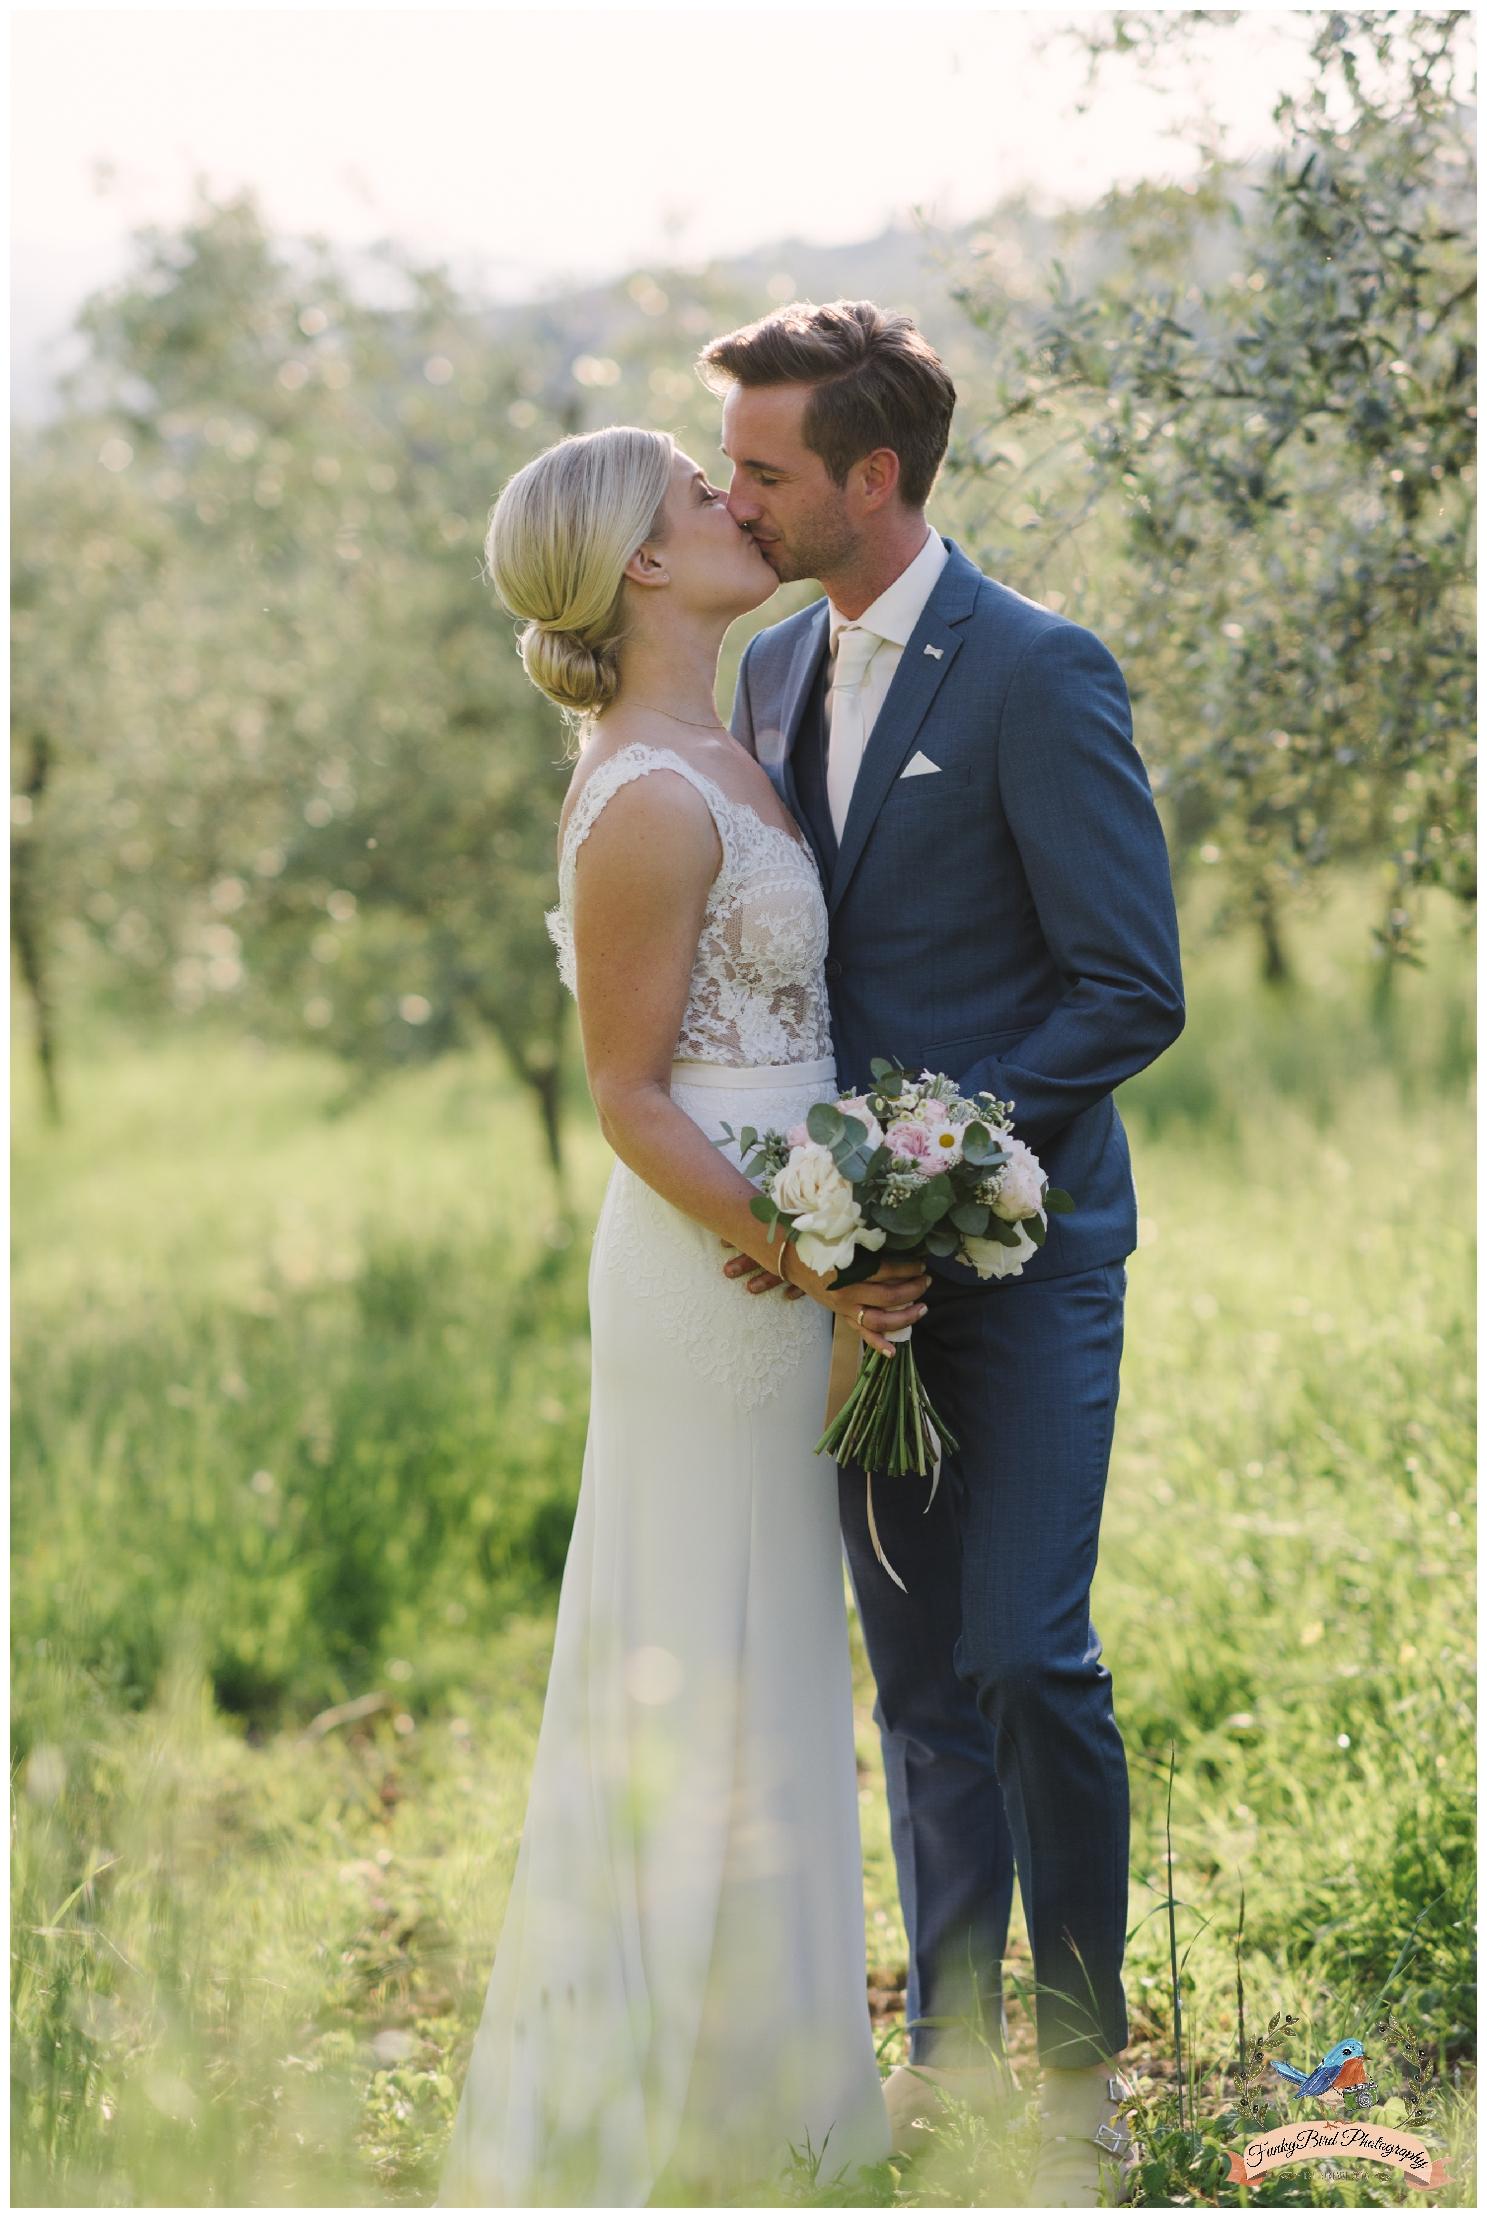 Wedding_Photographer_Tuscany_Italy_0077.jpg